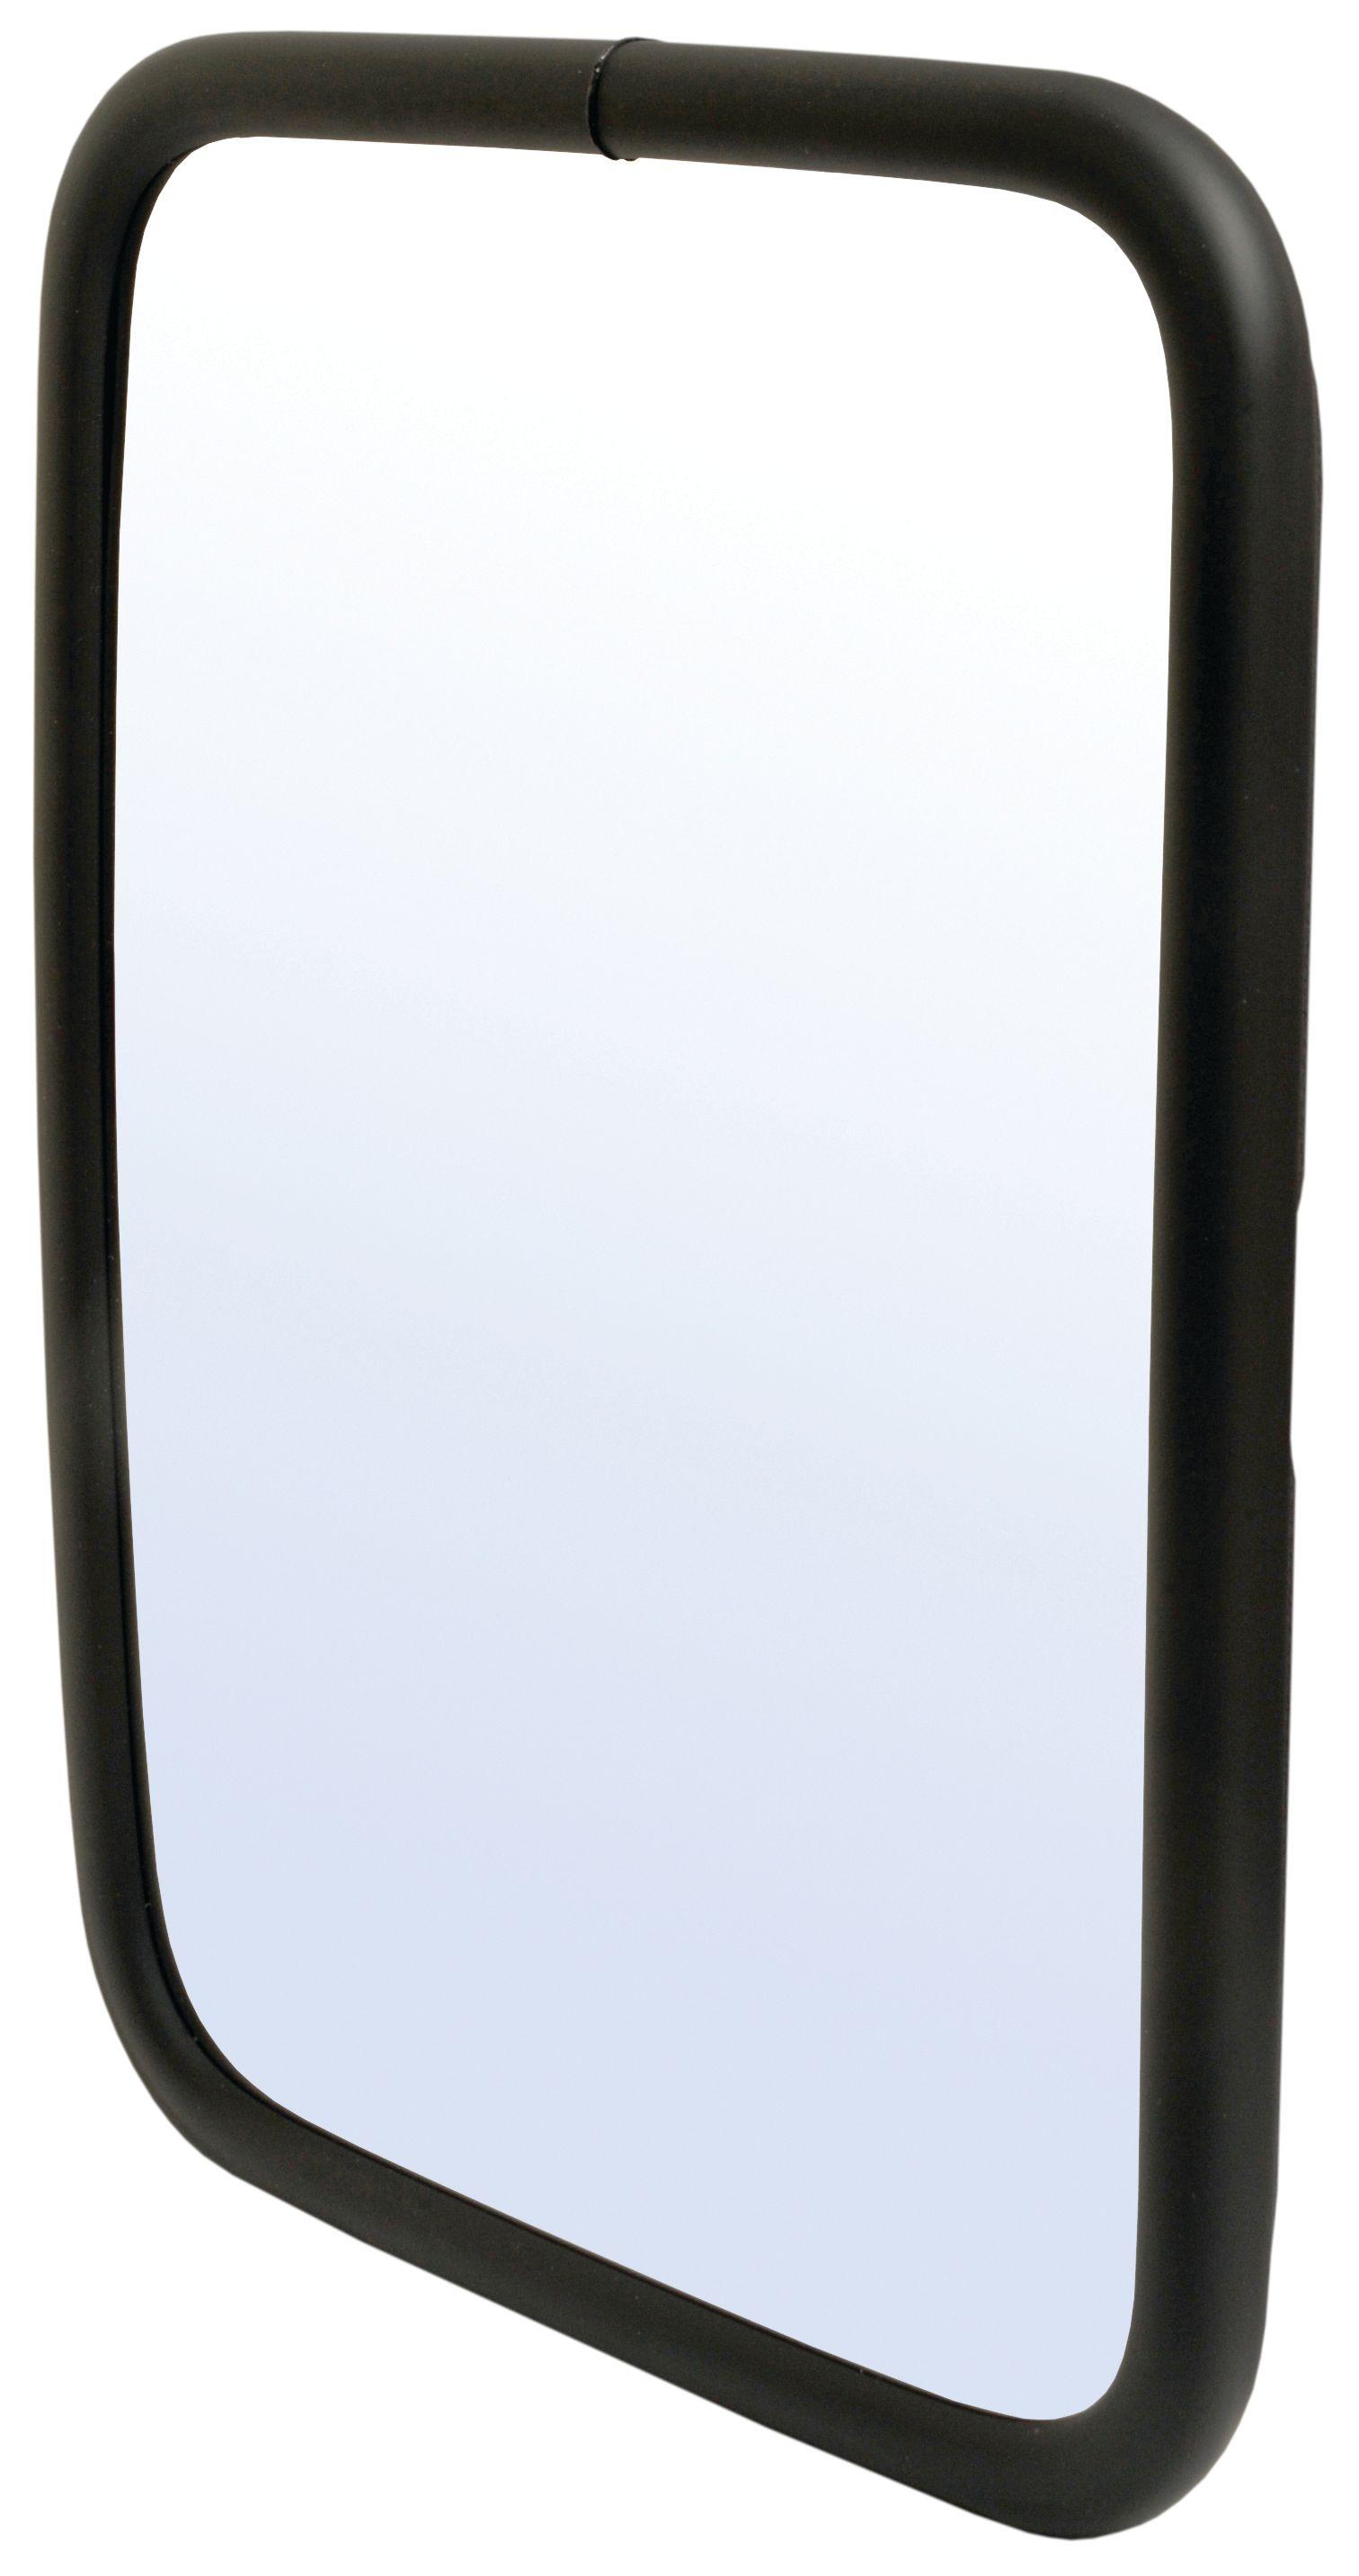 CASE IH MIRROR-205X300MM-HEAD-CONVEX